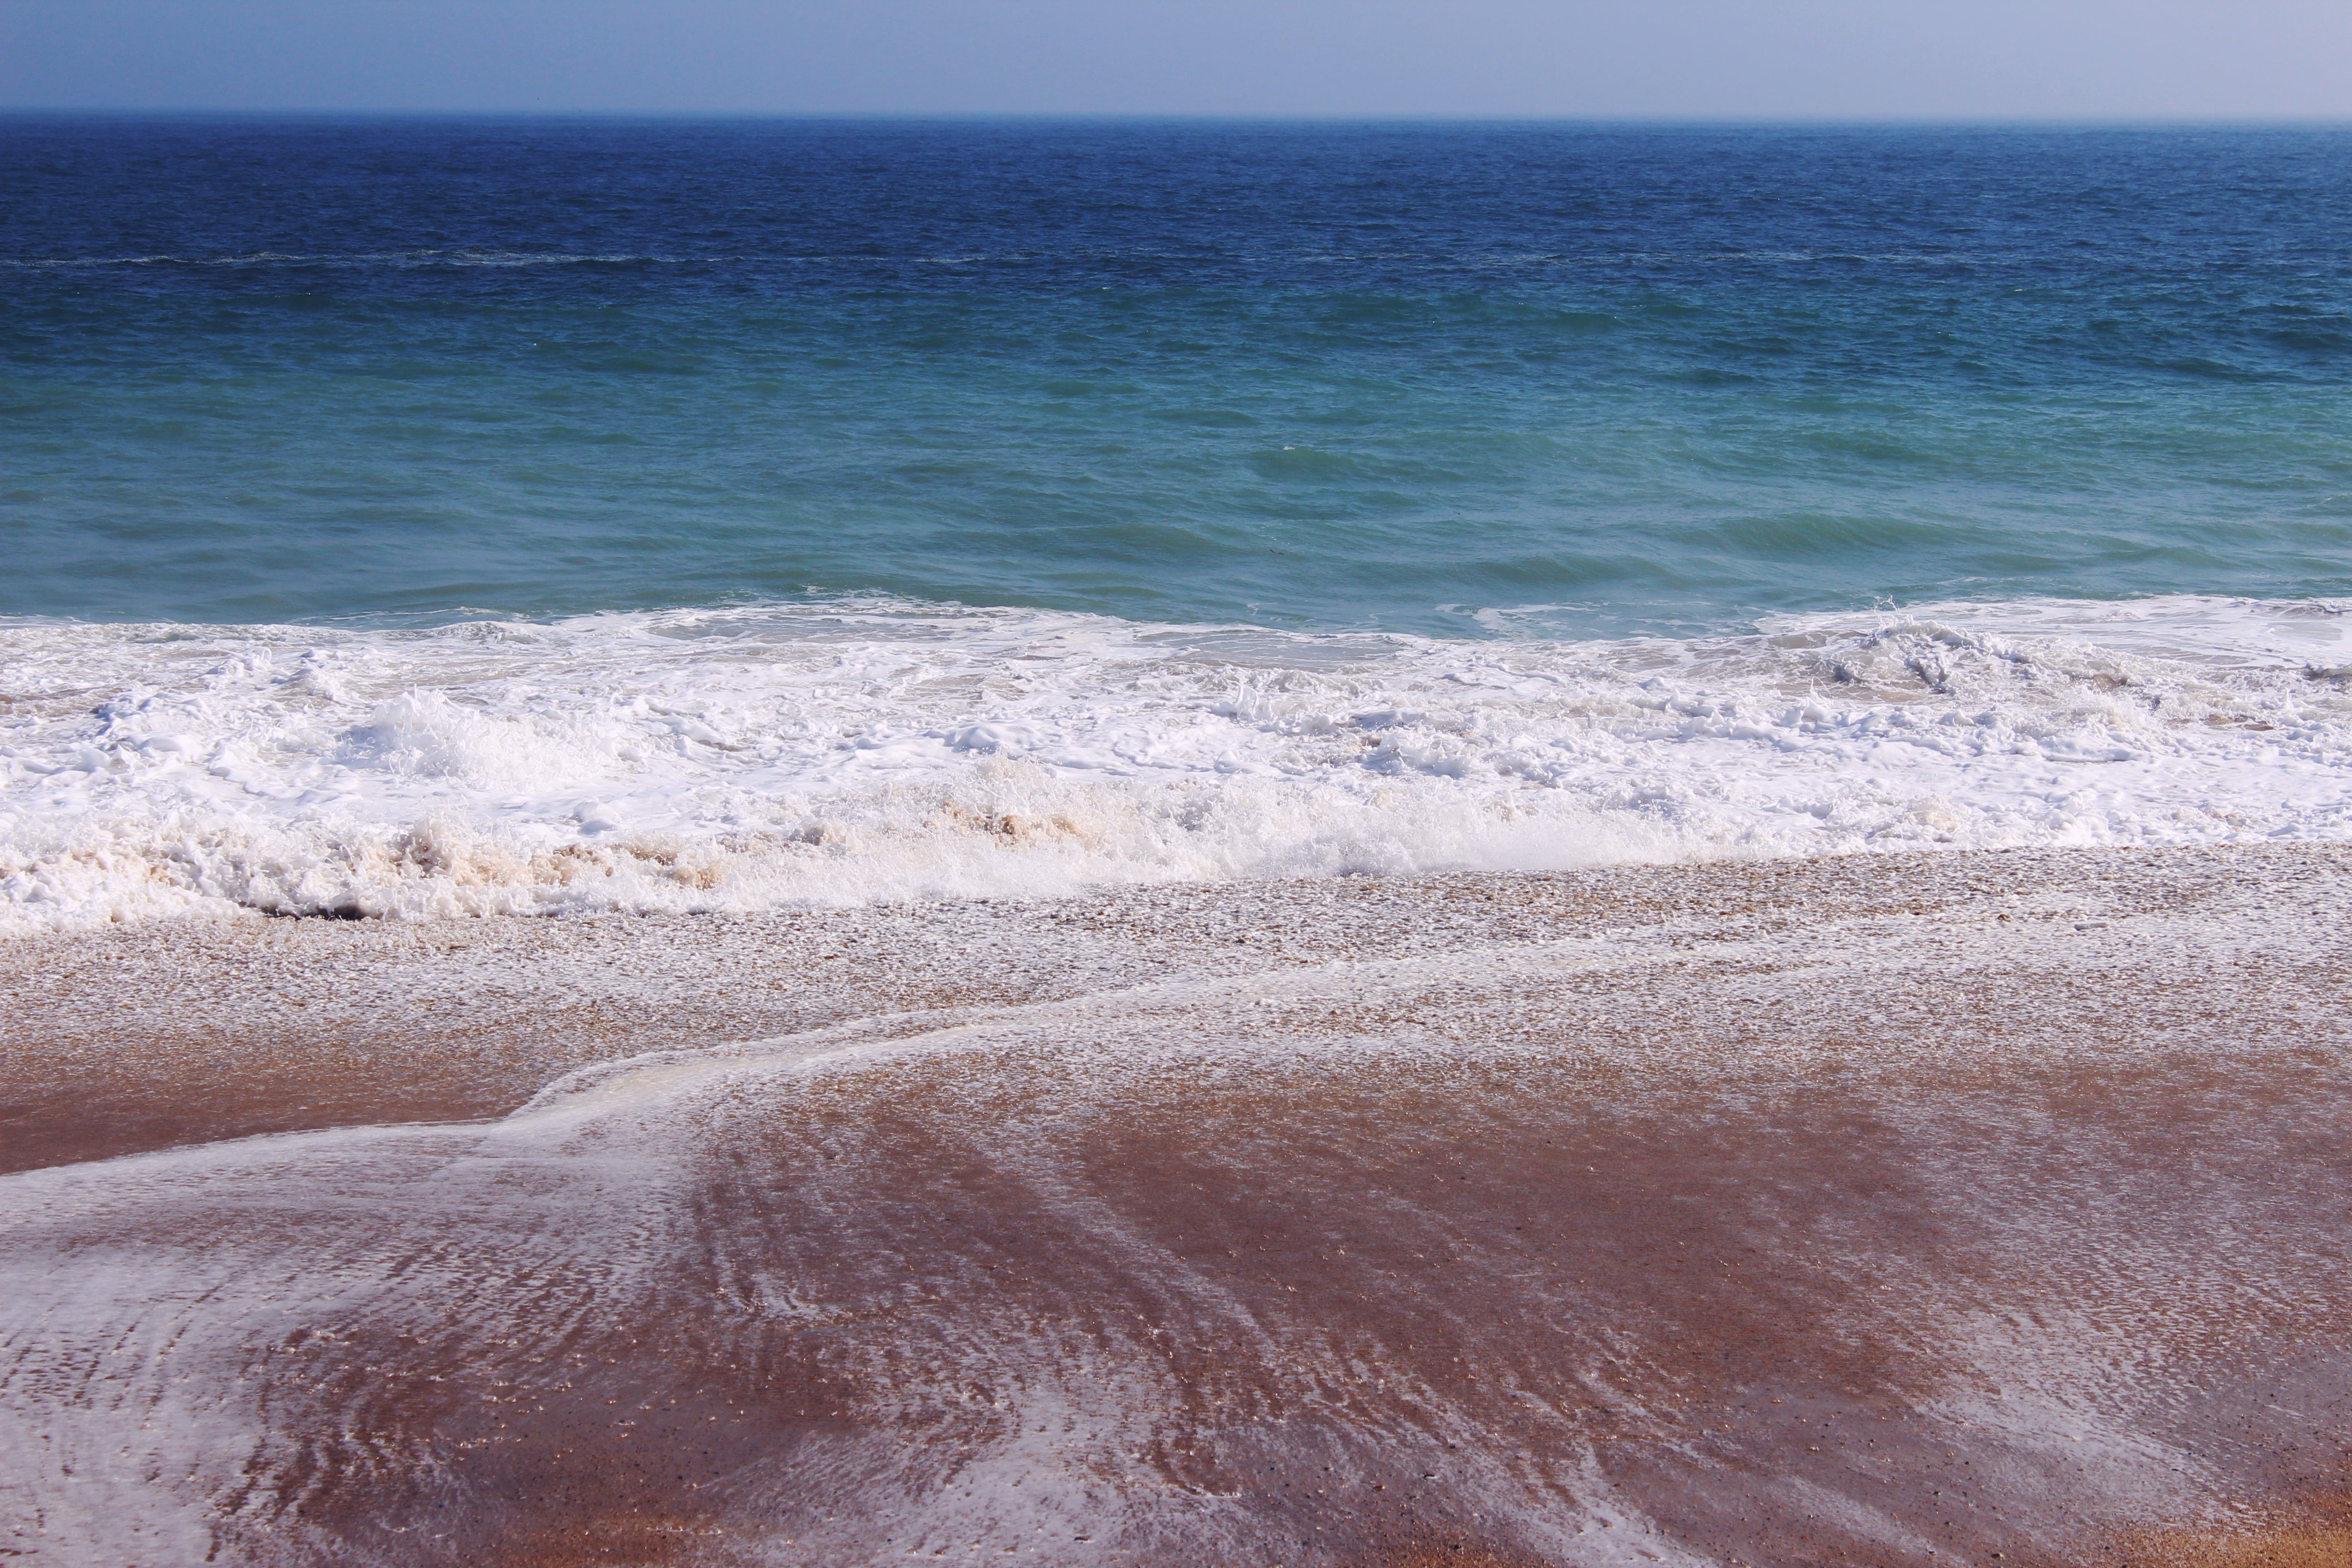 Fotos de stock gratuitas de agua, arena, dice adiós, escénico